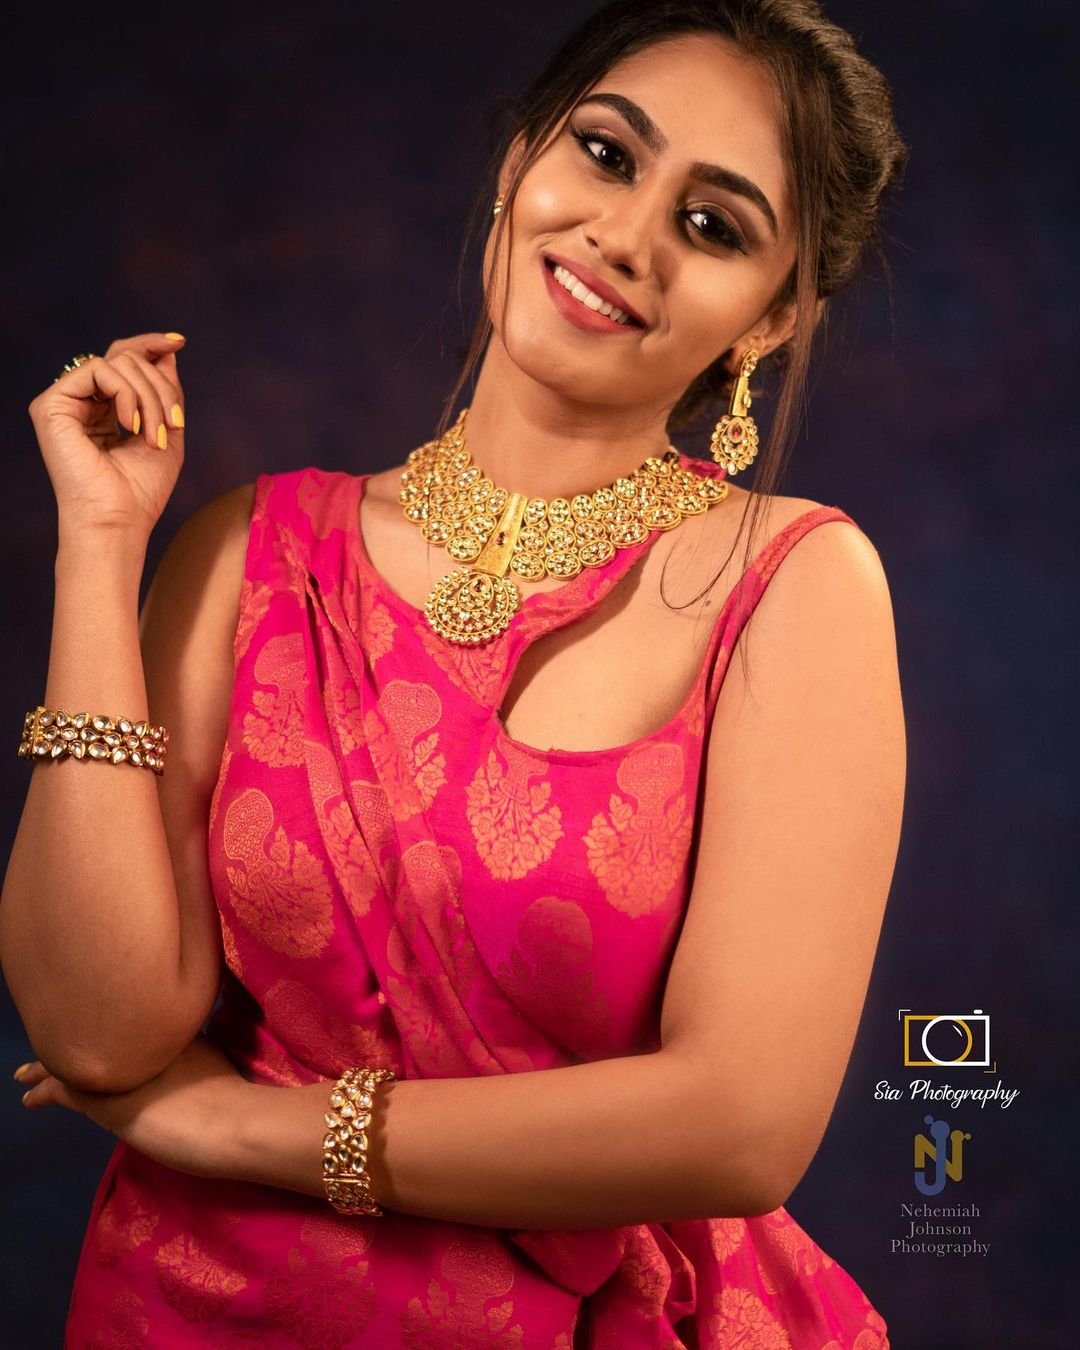 Sreethu Krishnan Photos hd (45)